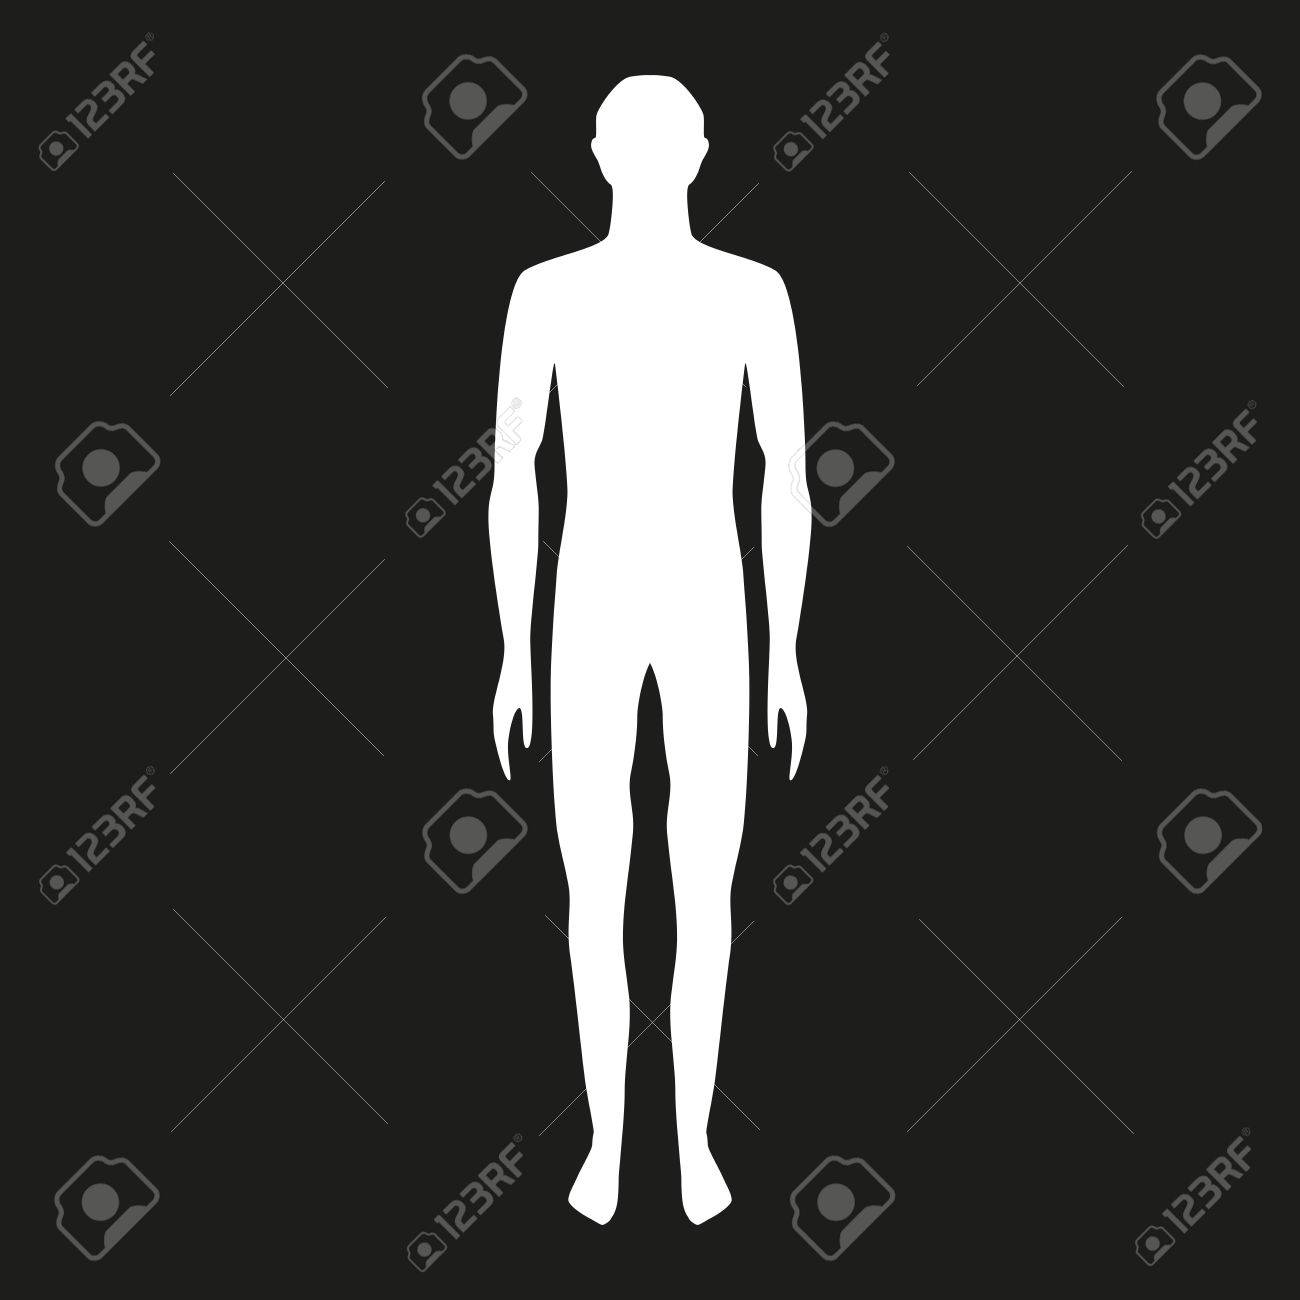 Male Body Shapes Human Outline Vector Illustration Full